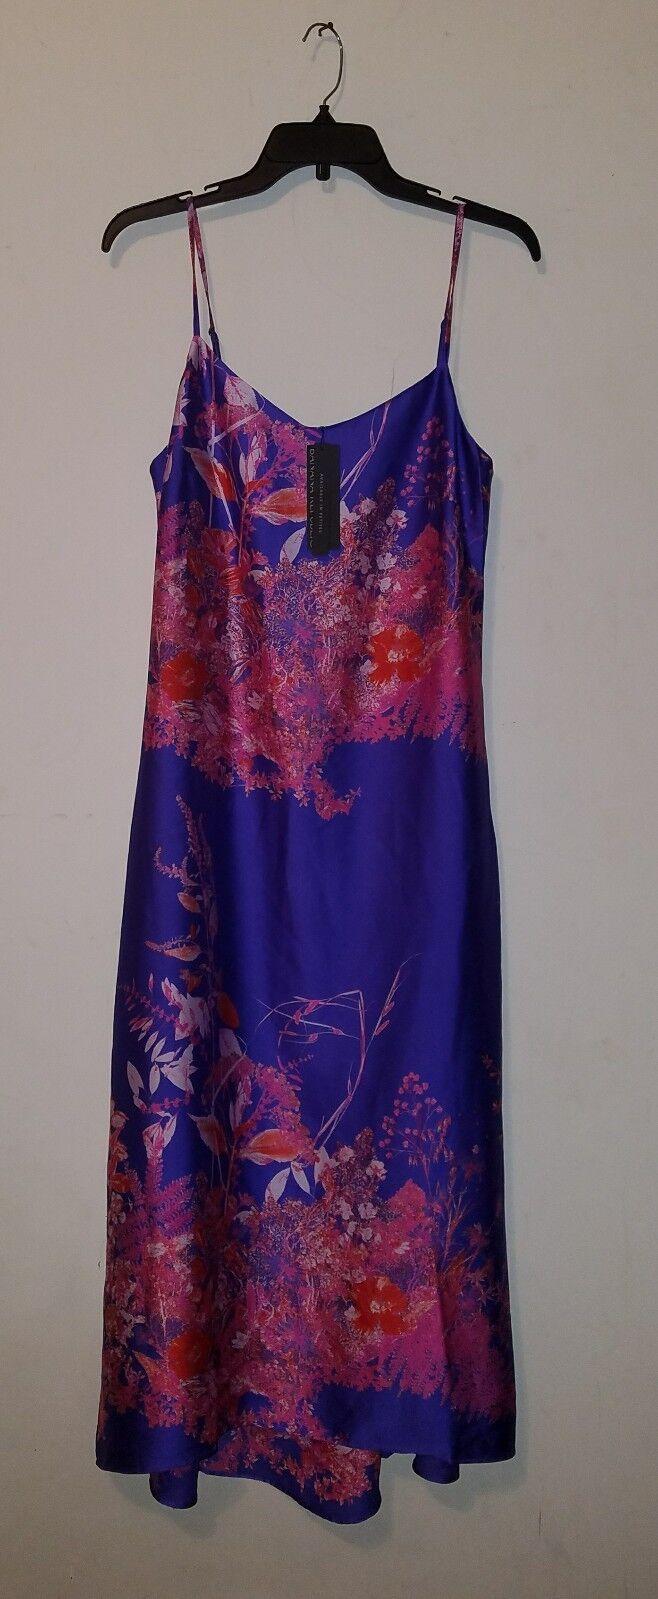 NWT Banana Republic Woherren Floral Strappy Midi Slip dress  lila sz 4